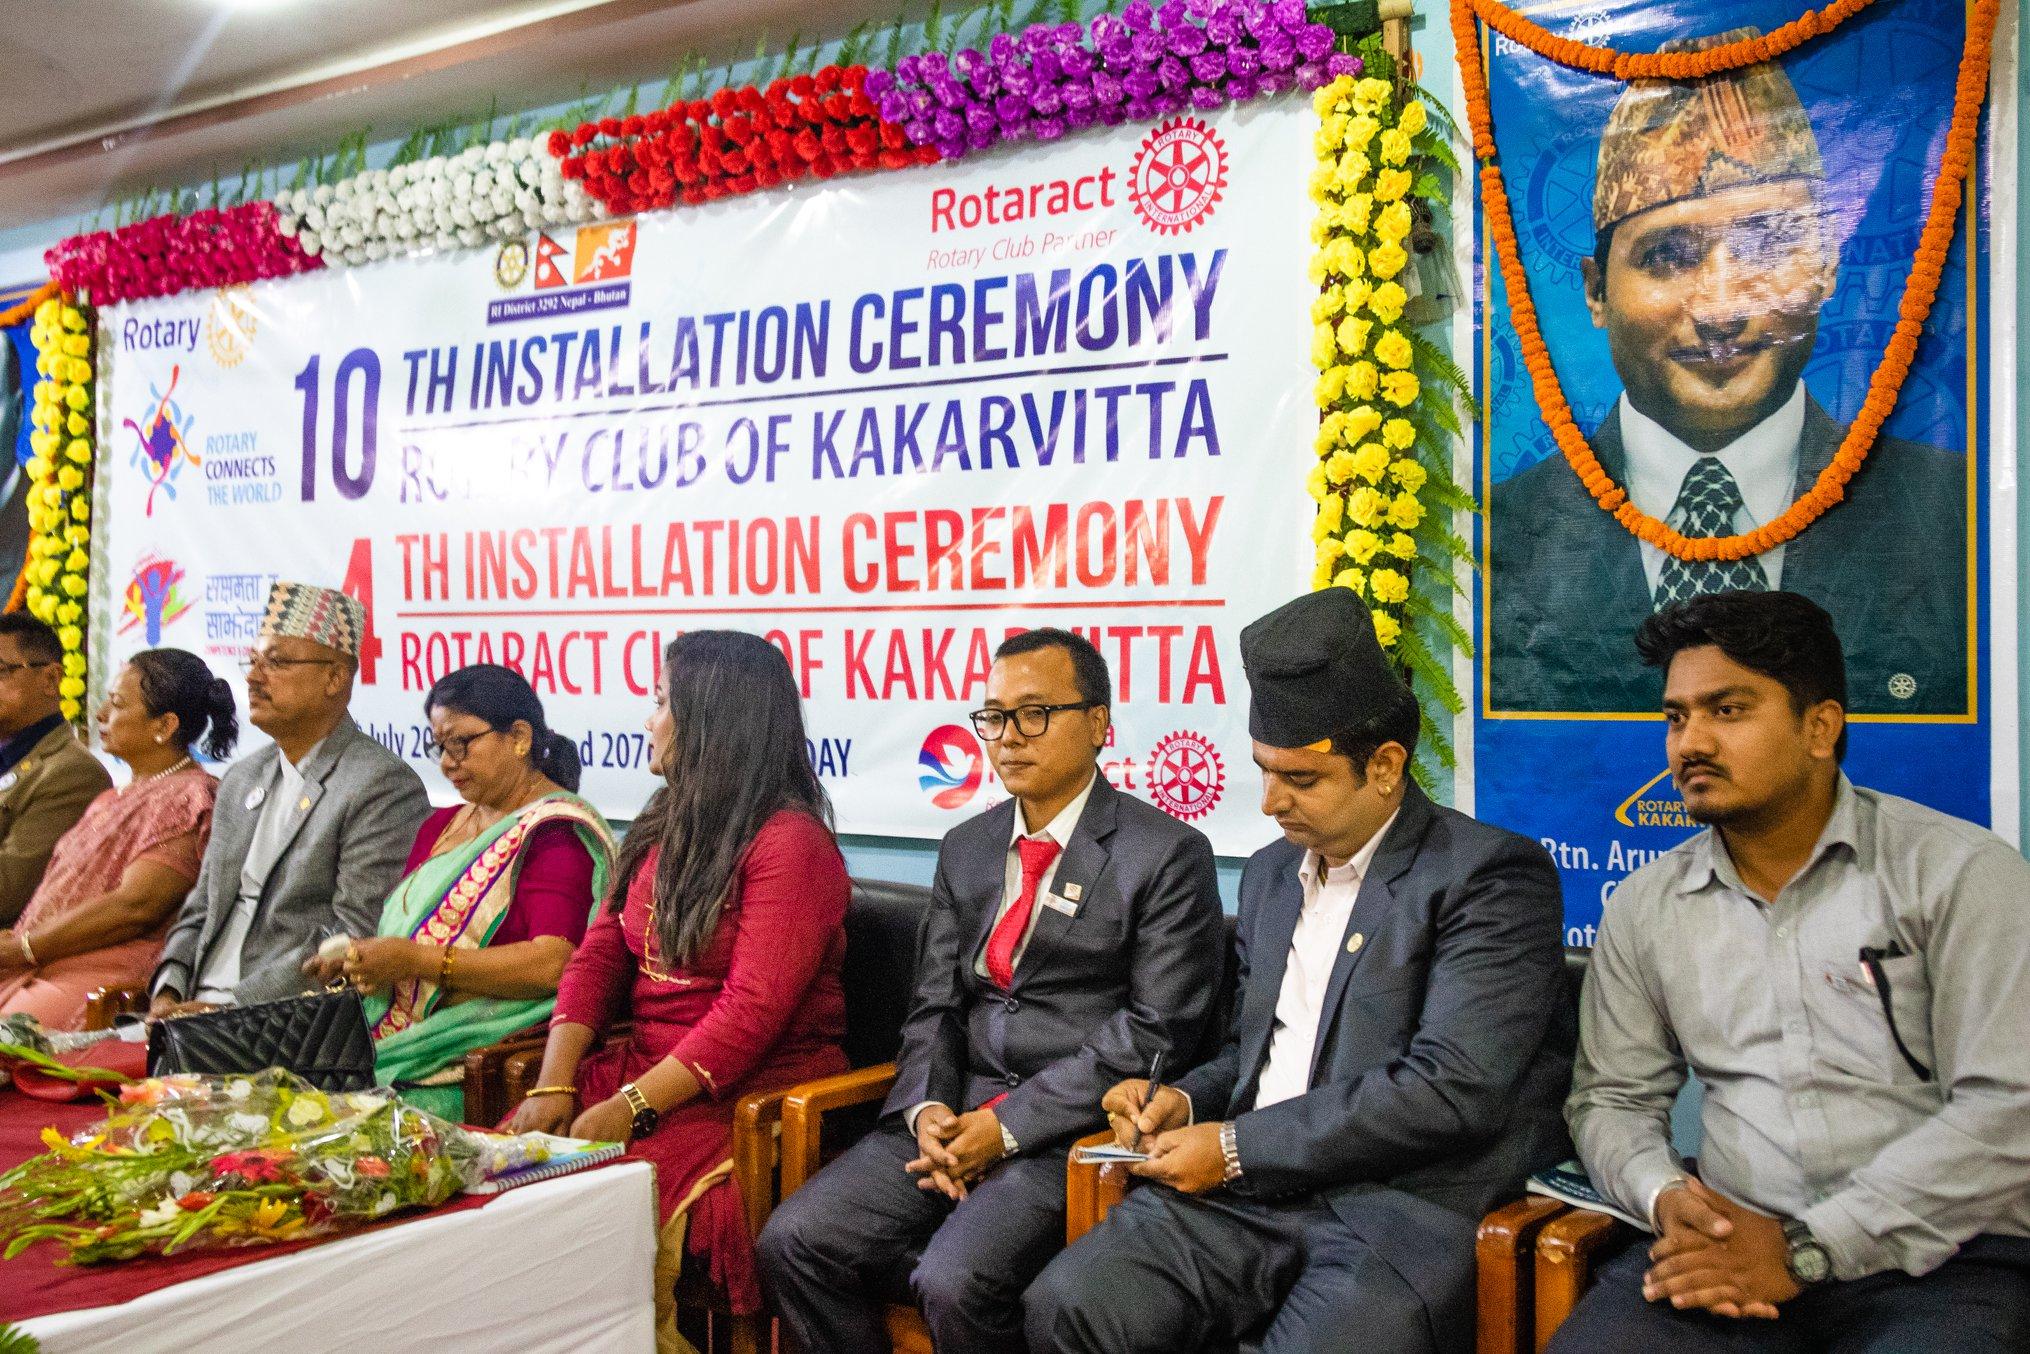 10th Installation Ceremony Rotary Club Of Kakarvitta 5